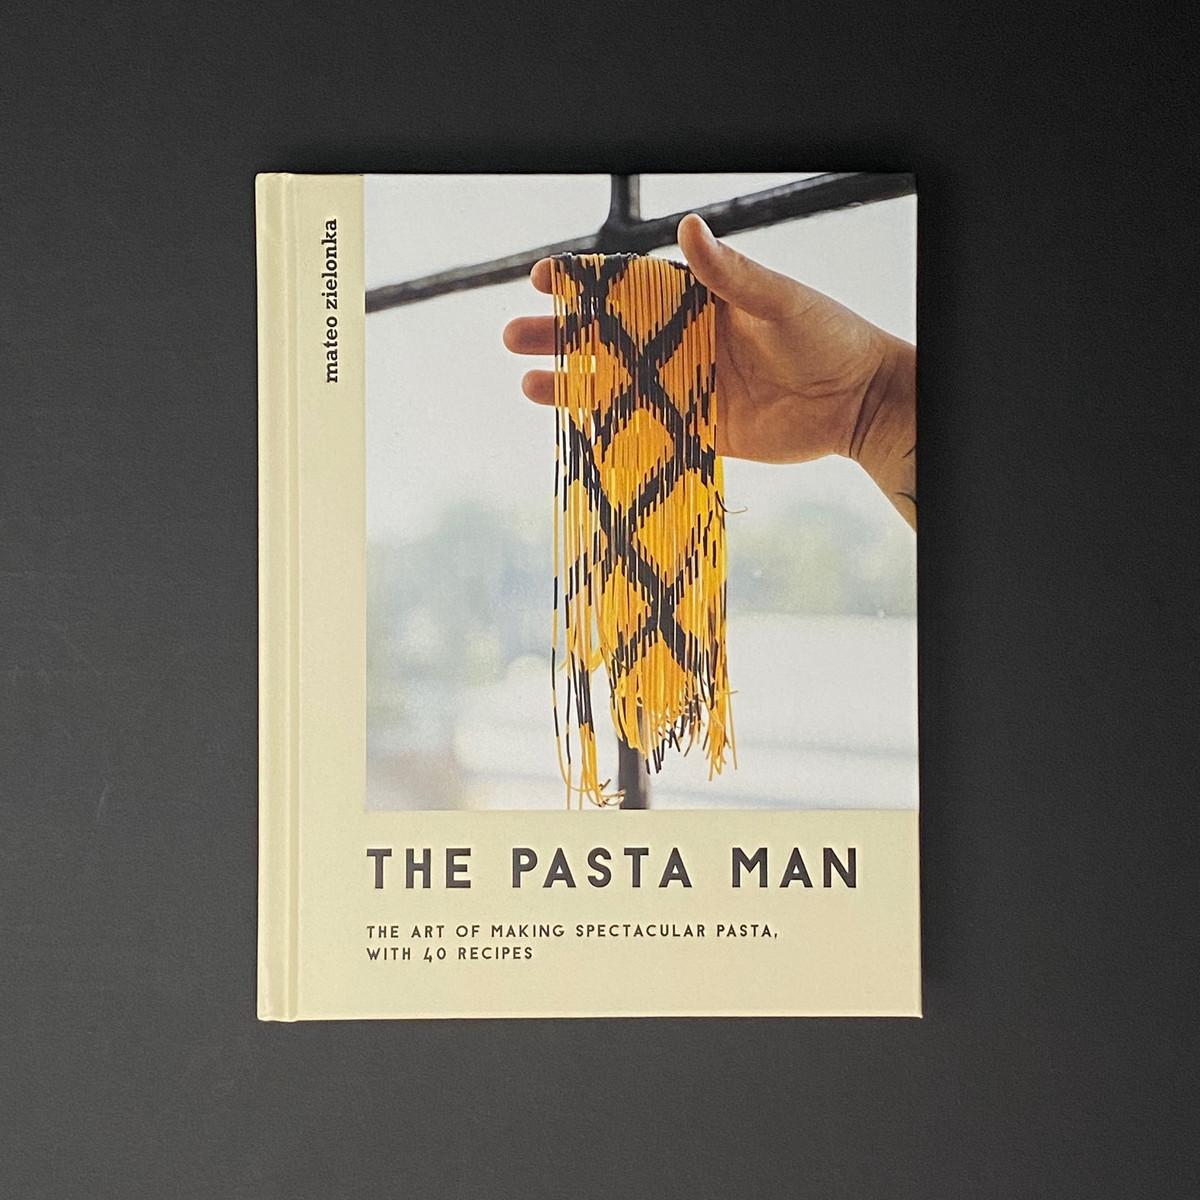 The Pasta Man: The Art of Making Spectacular Pasta | Mateo Zielonka